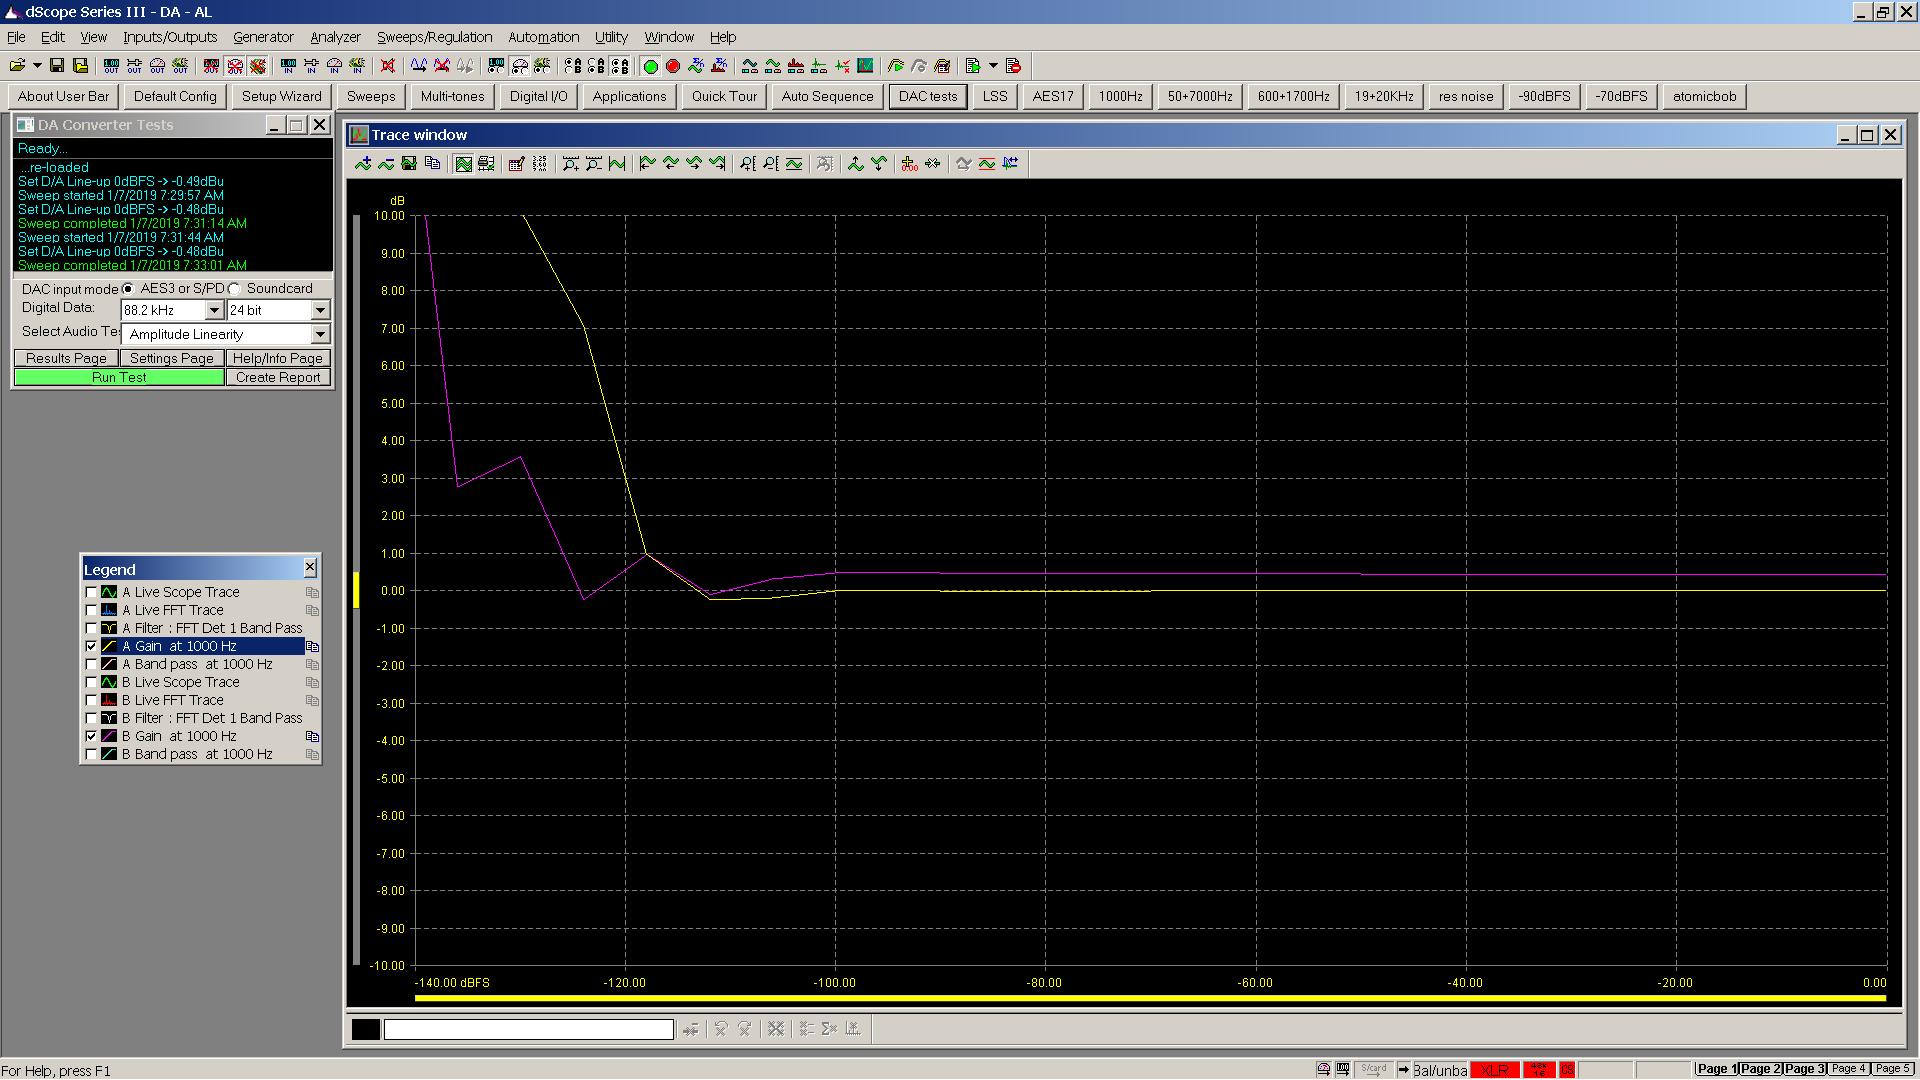 03 20190107-11 convert2 Bal 1 KHz gain linearity - AES -18dBFS ref 0 dBu out - int atten.PNG